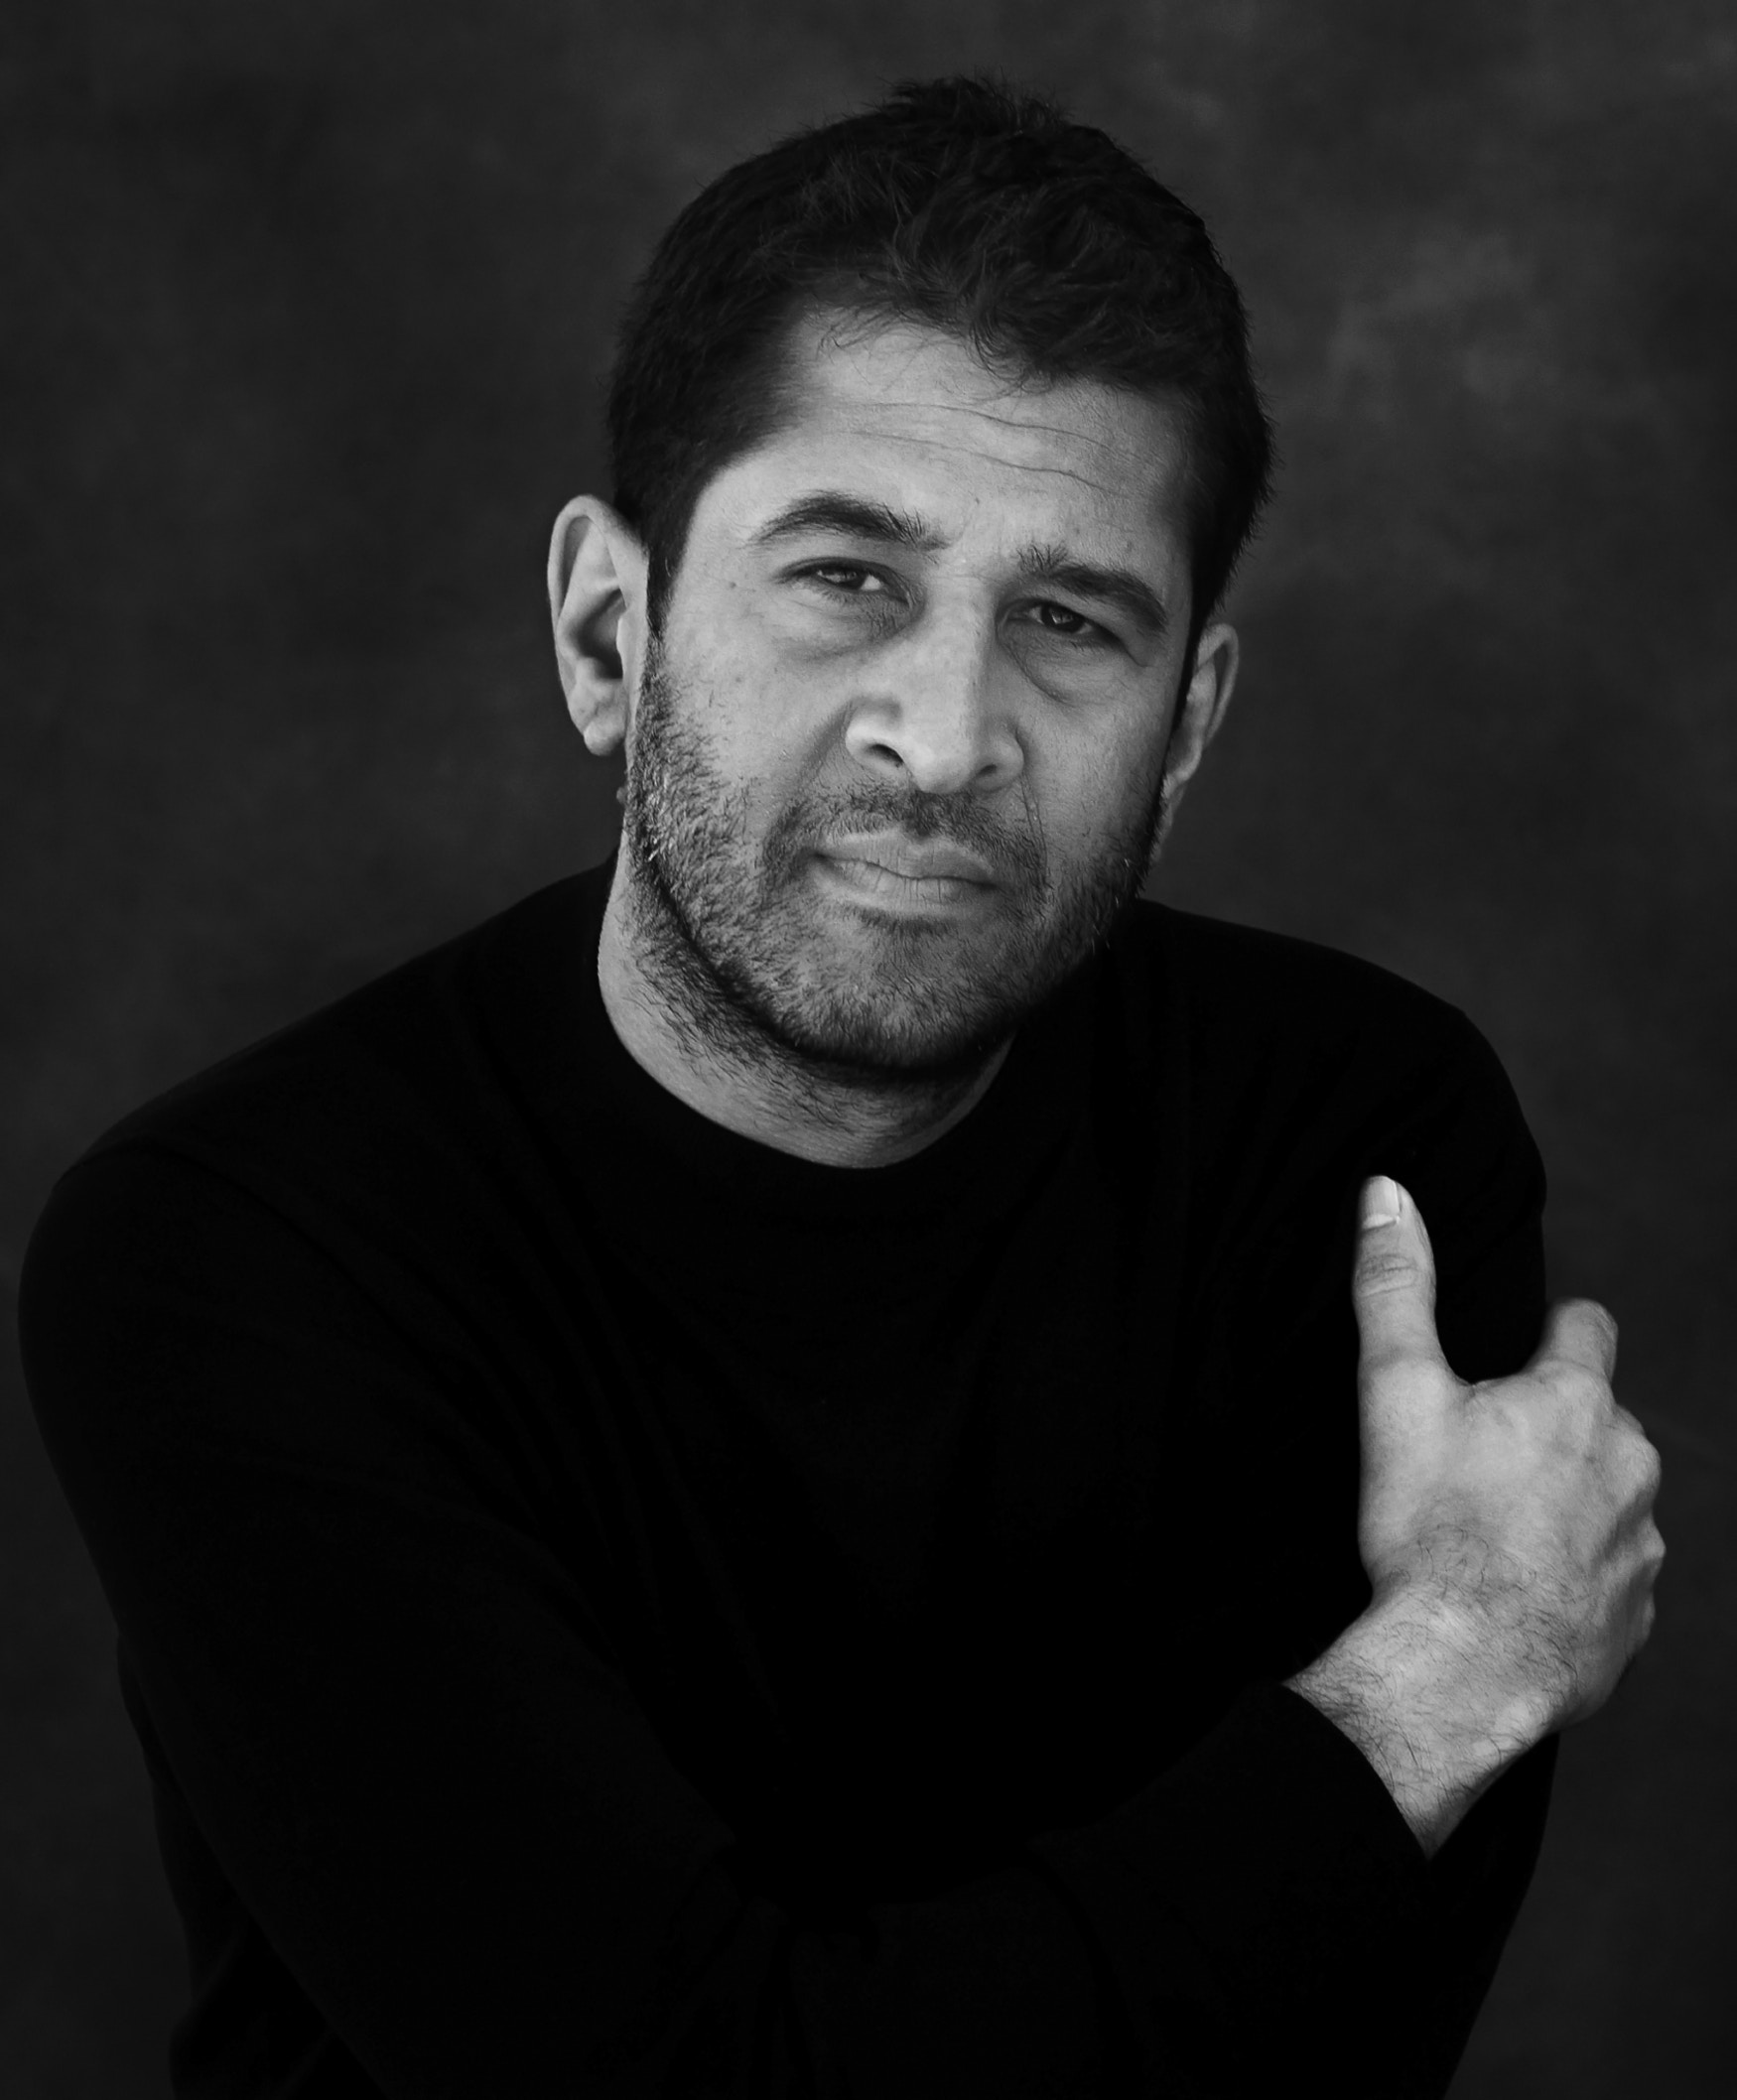 Komponist og dirigent Rolf Gupta